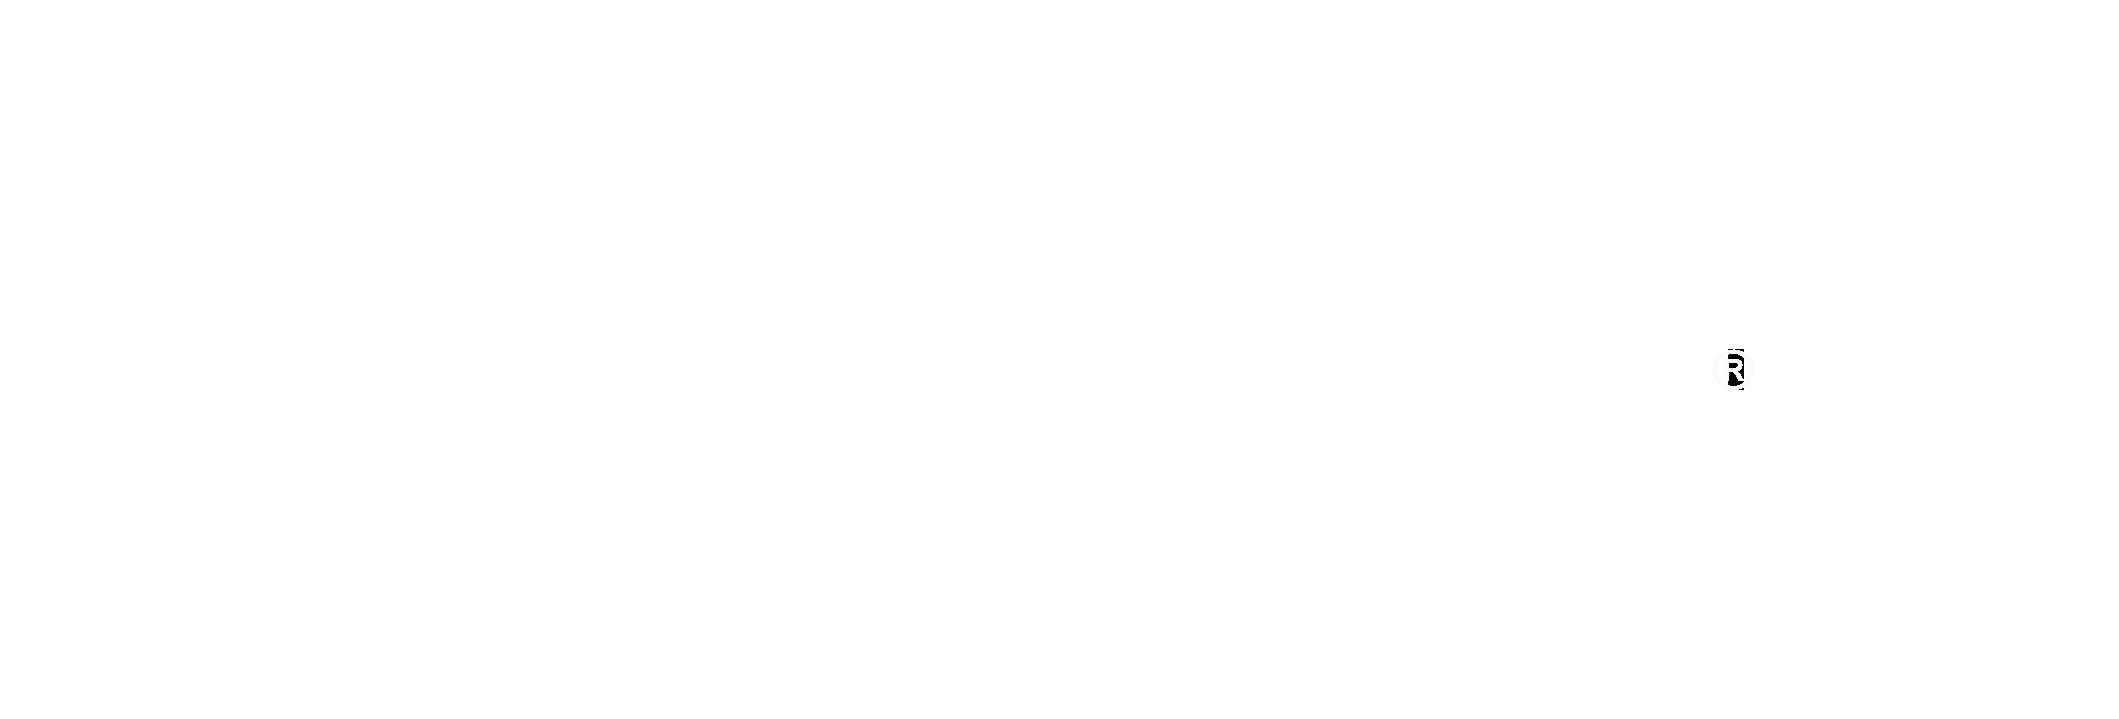 Lee Miller signature image